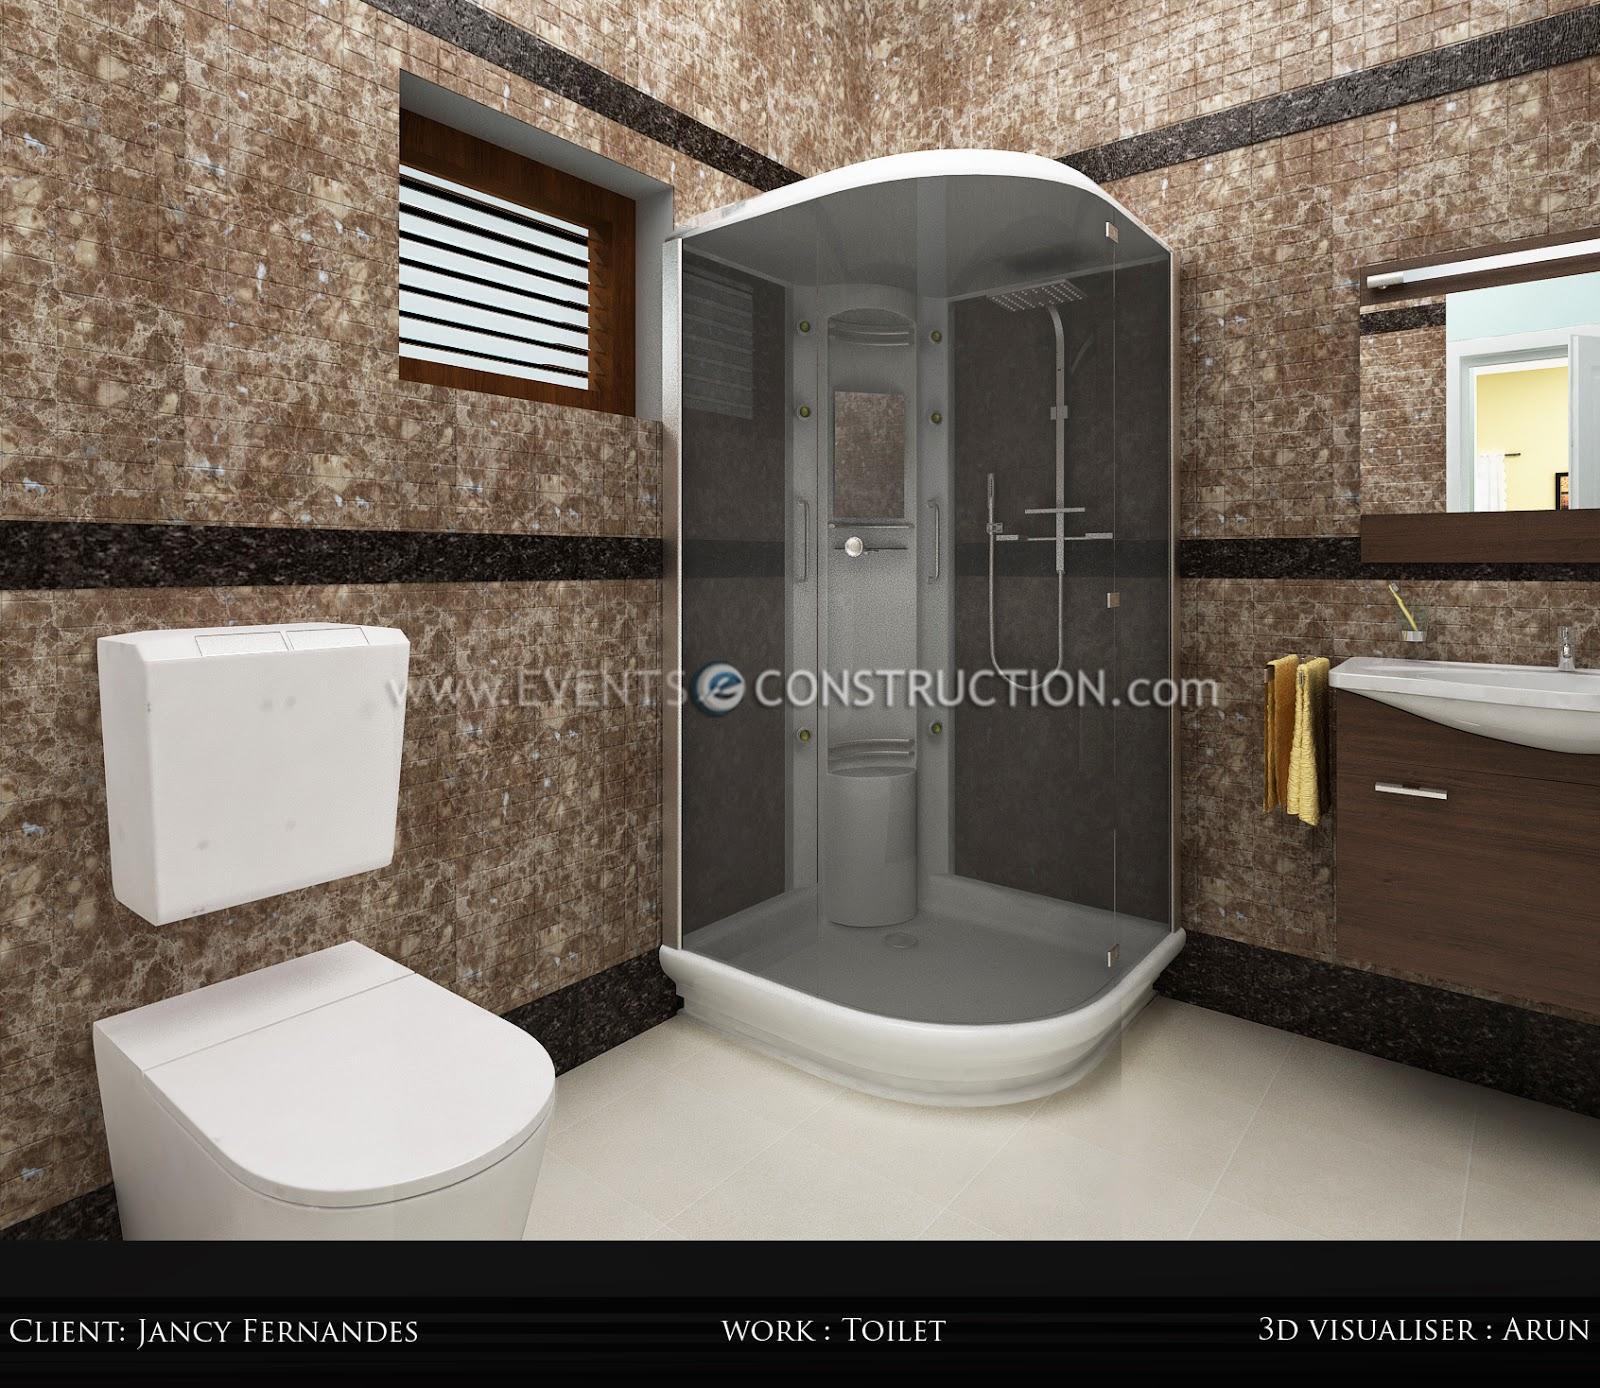 Bathroom Interior Design: Evens Construction Pvt Ltd: Bathroom Designed For Kerala Home